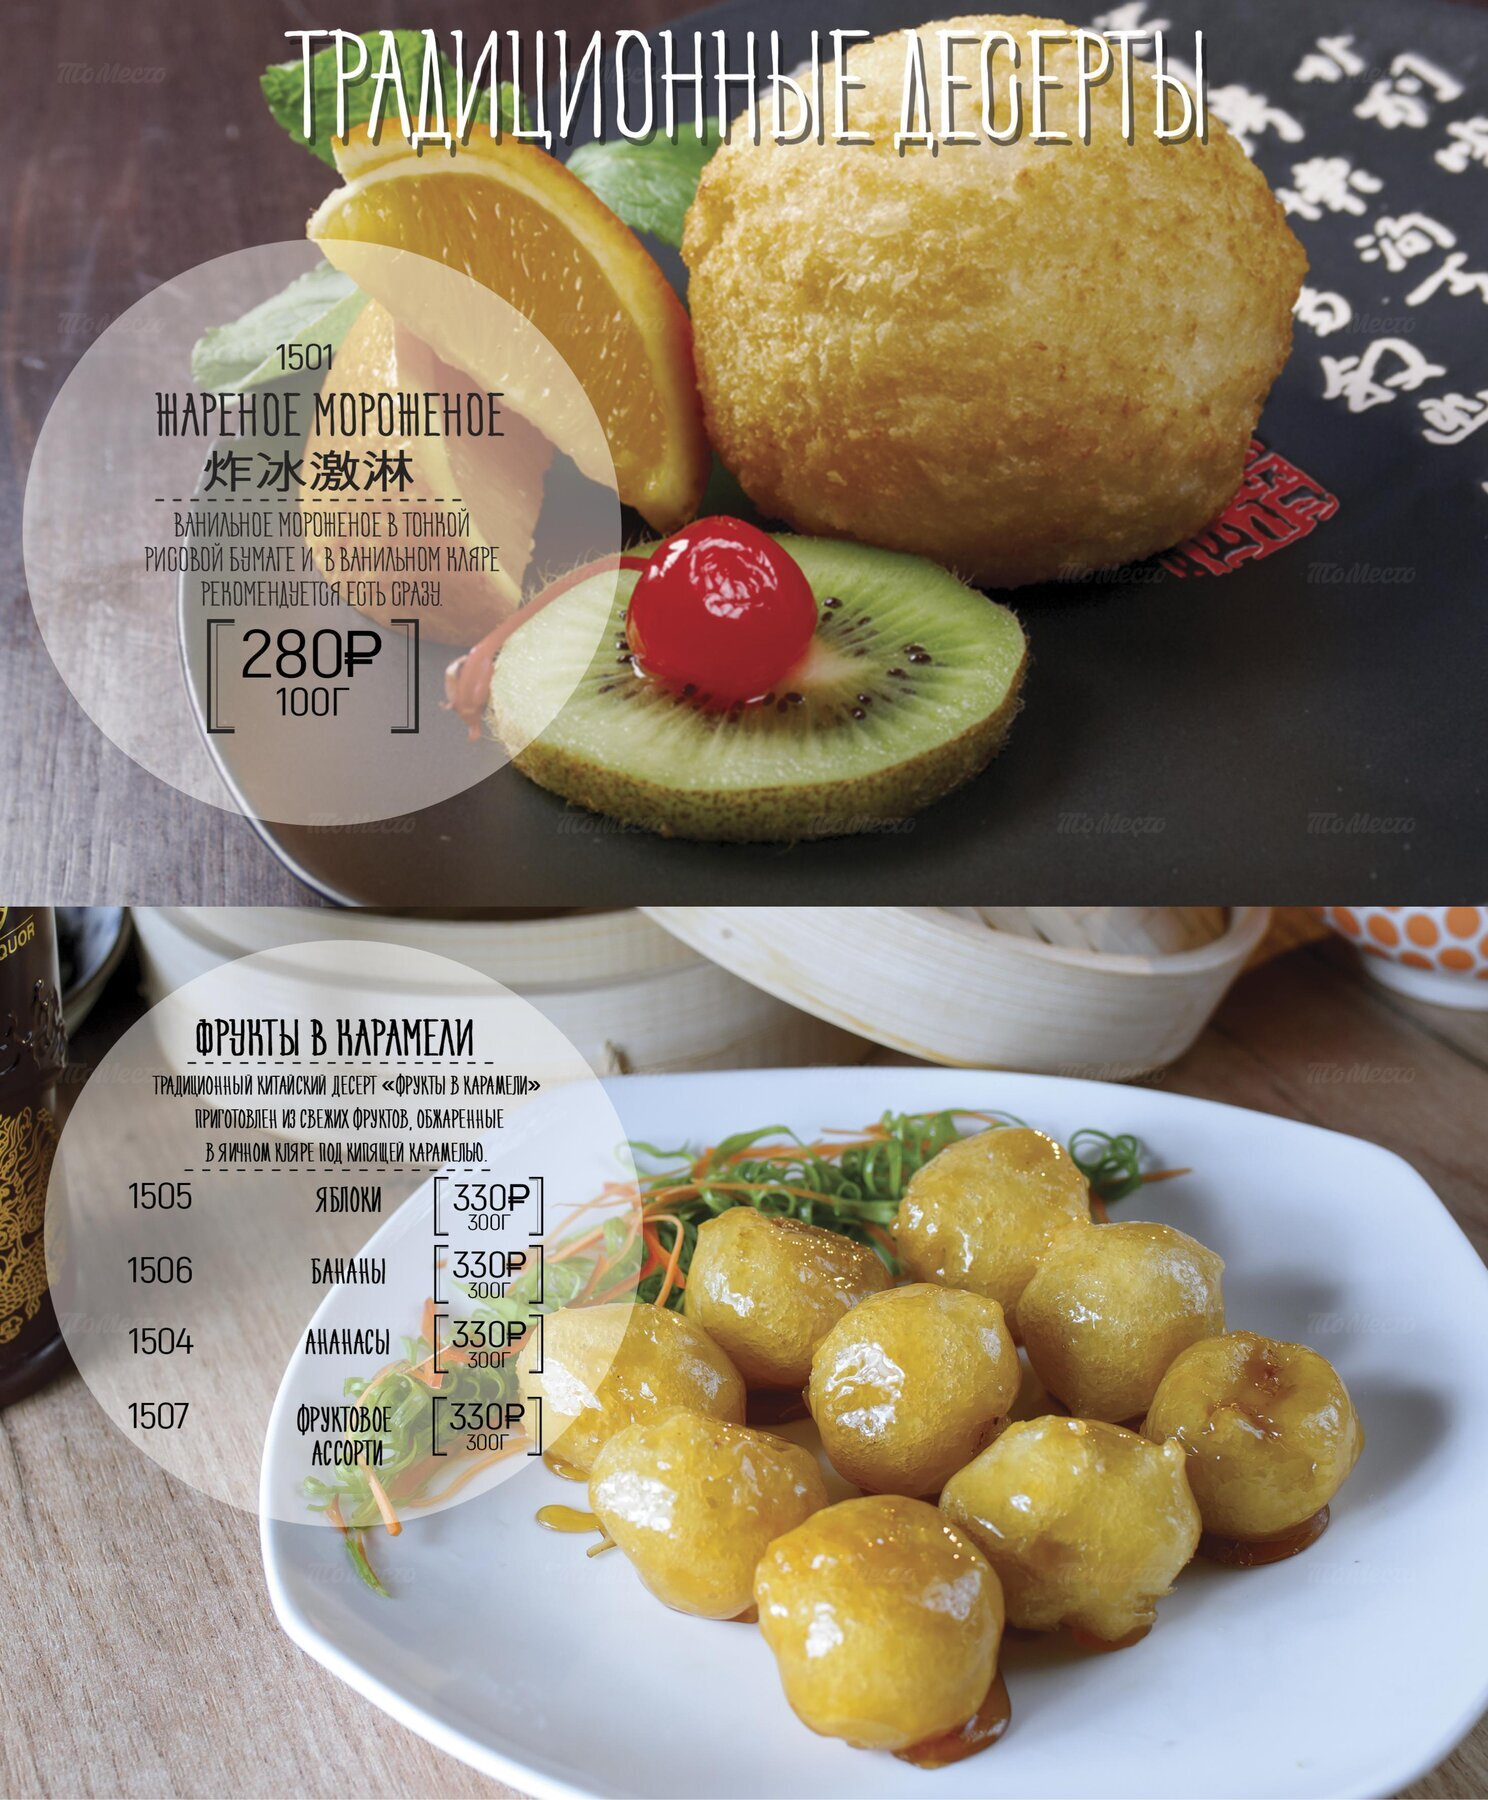 Меню ресторана Цзао Ван на Перекопской фото 34